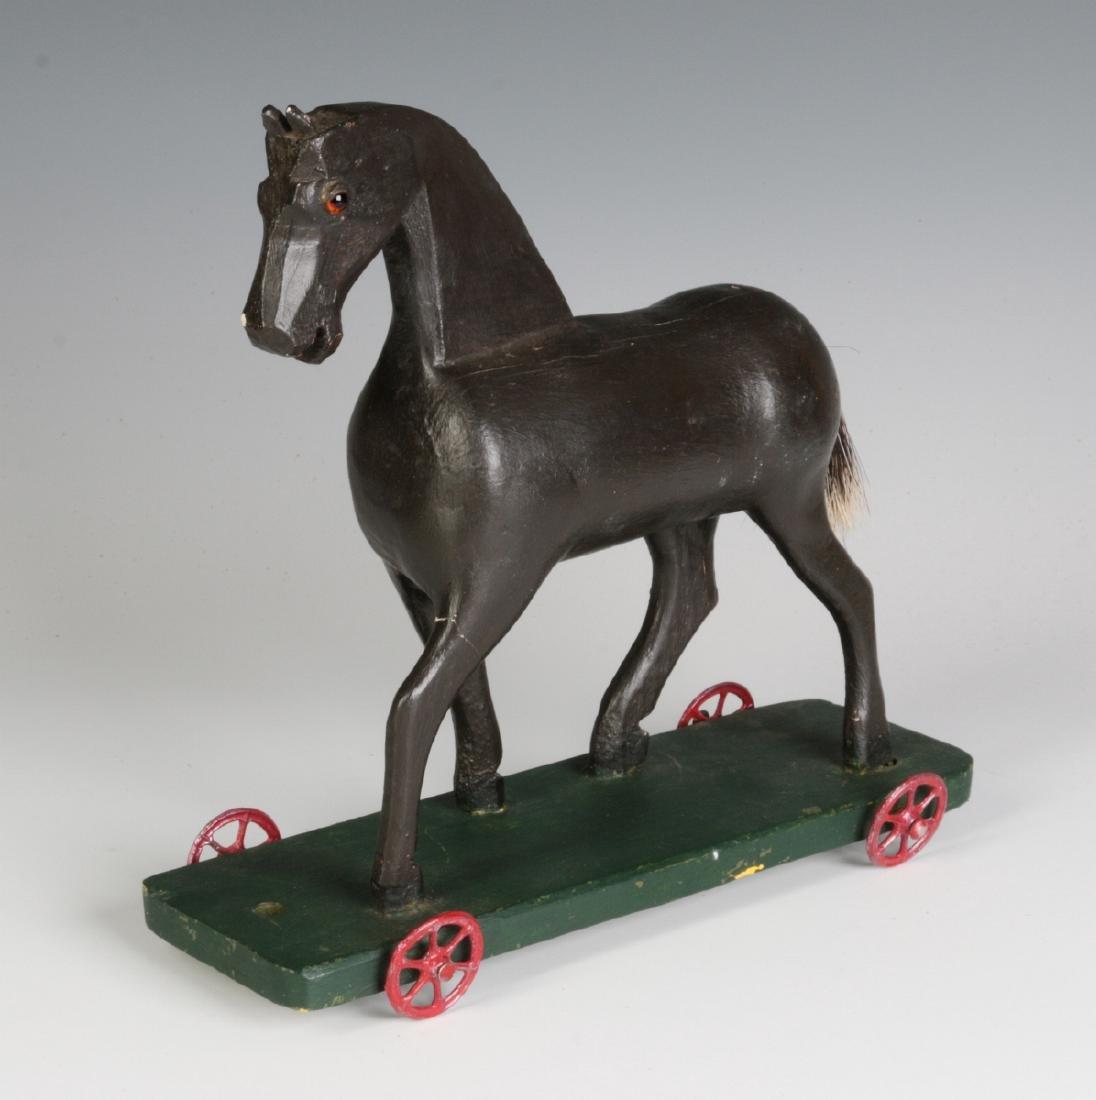 A CIRCA 1900 FOLK ART CARVED WOOD PLATFORM HORSE - 4